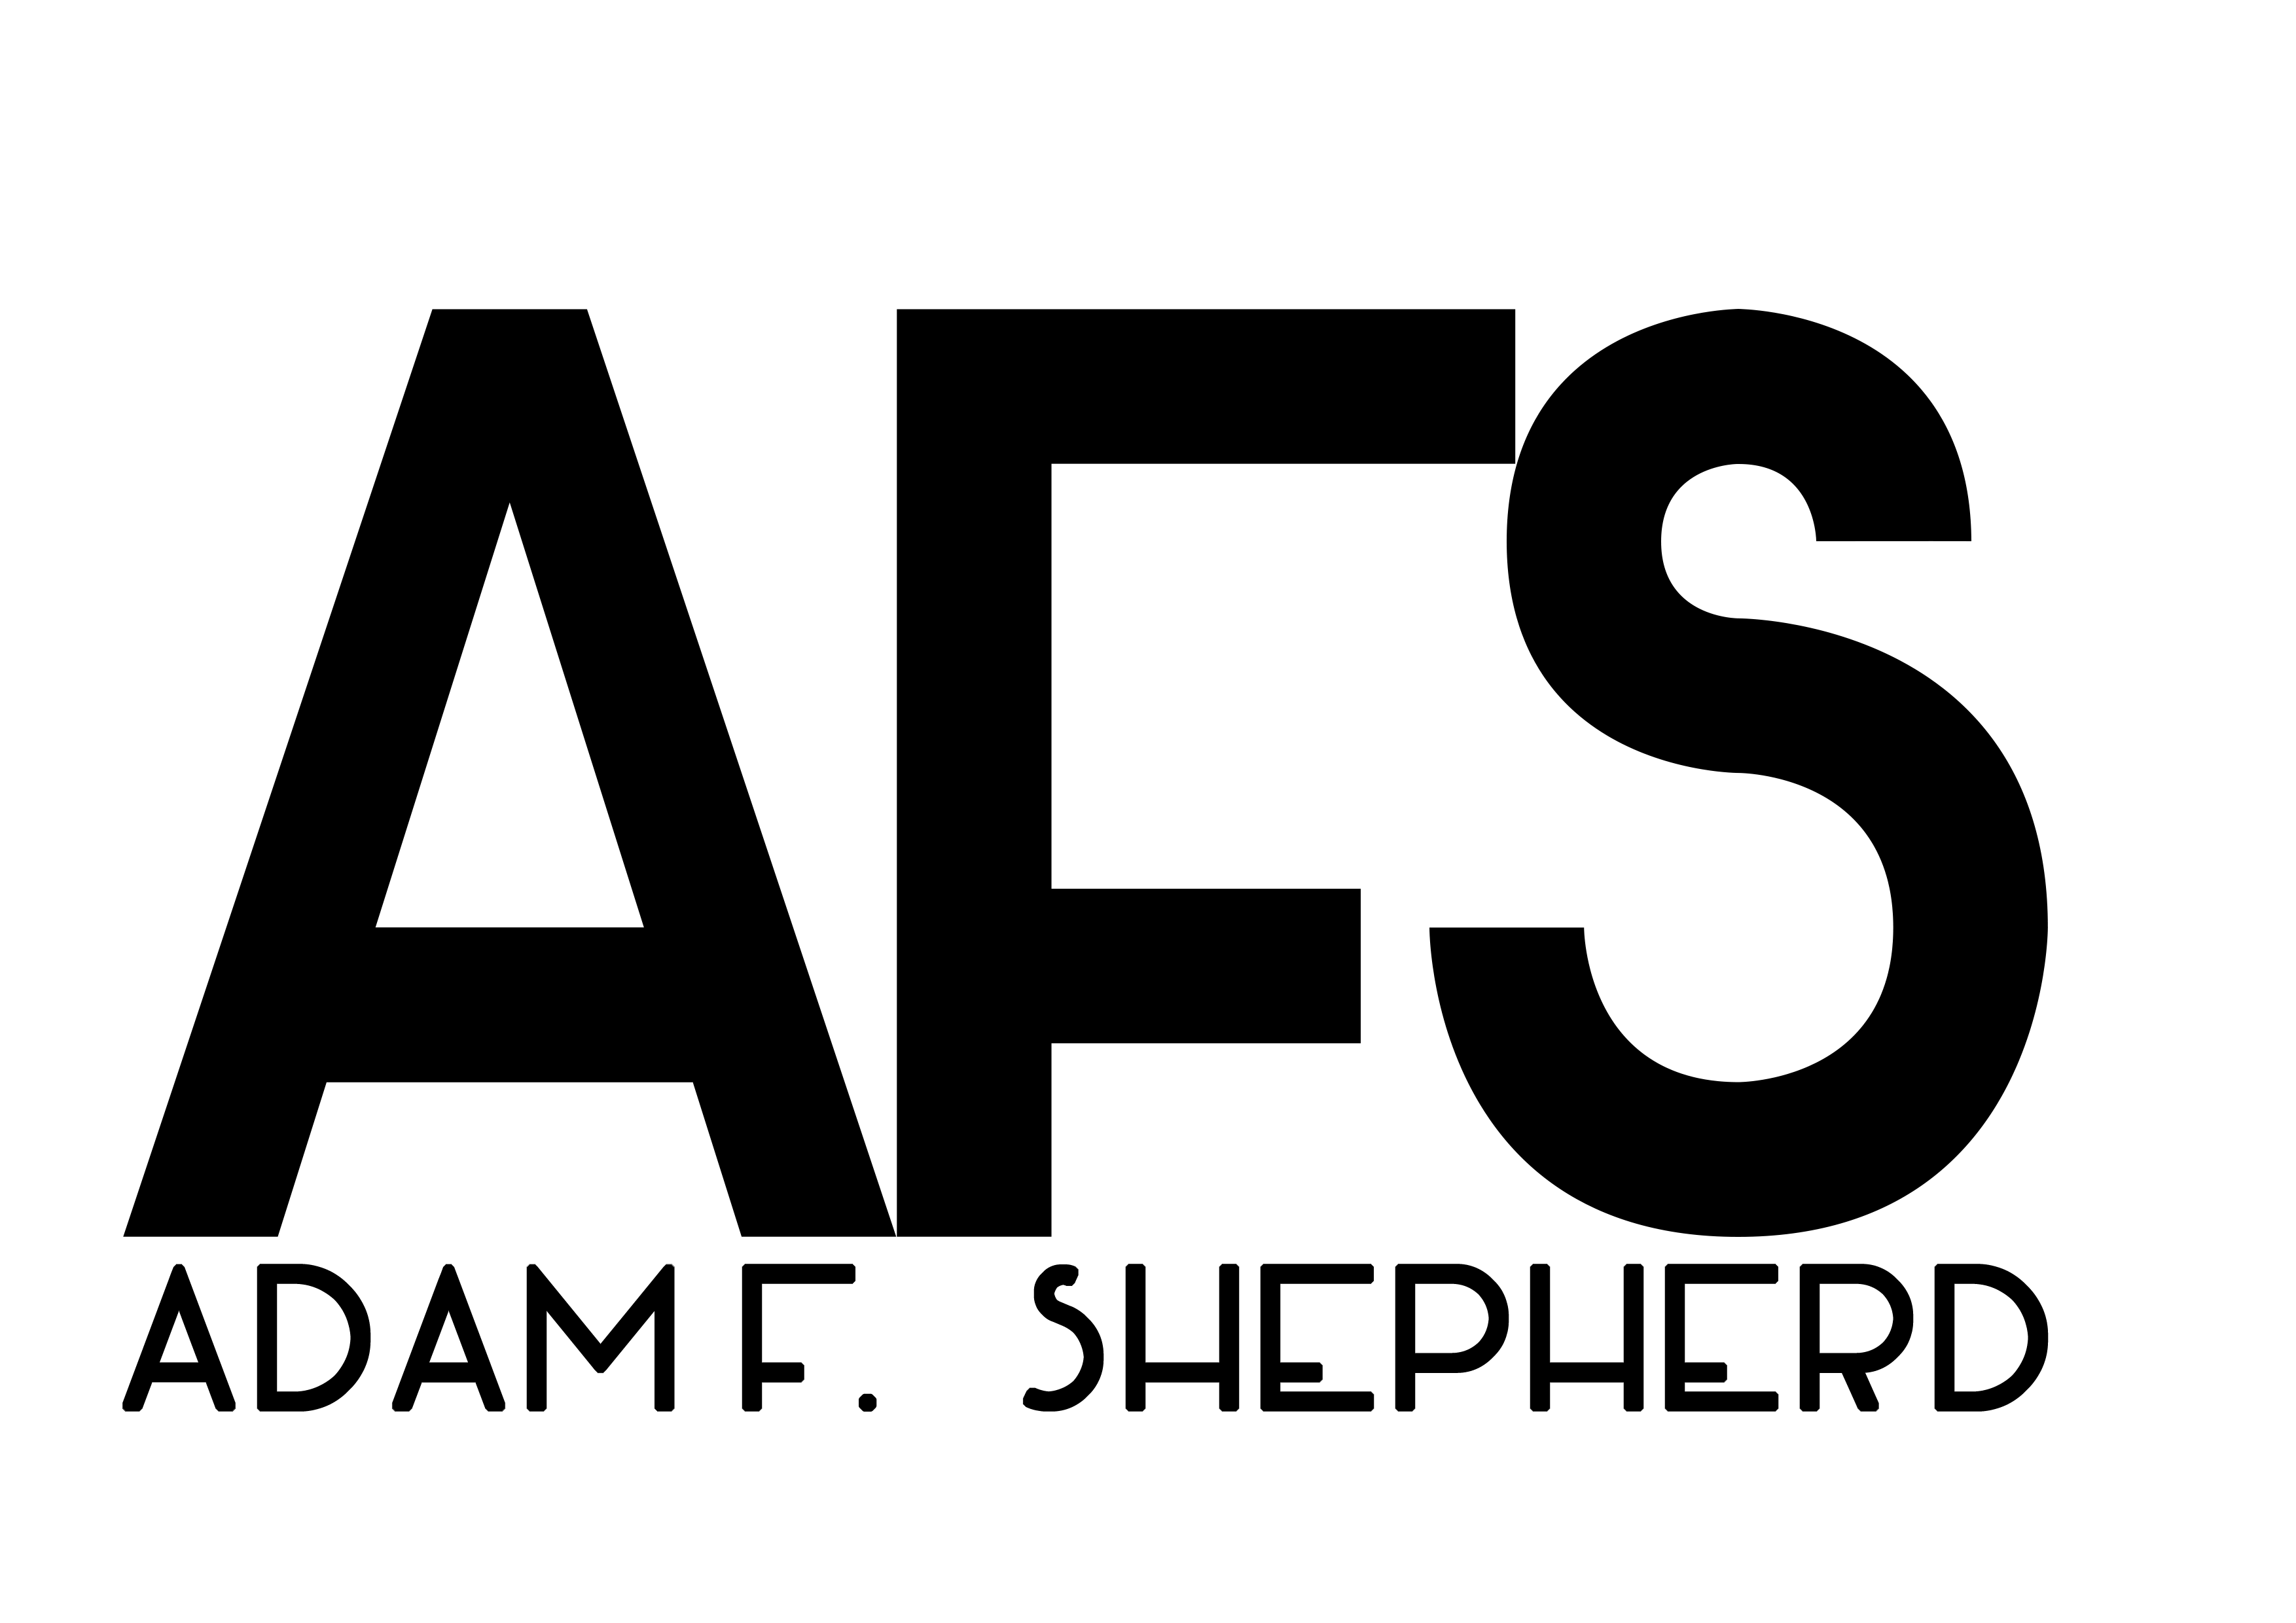 Adam F. Shepherd